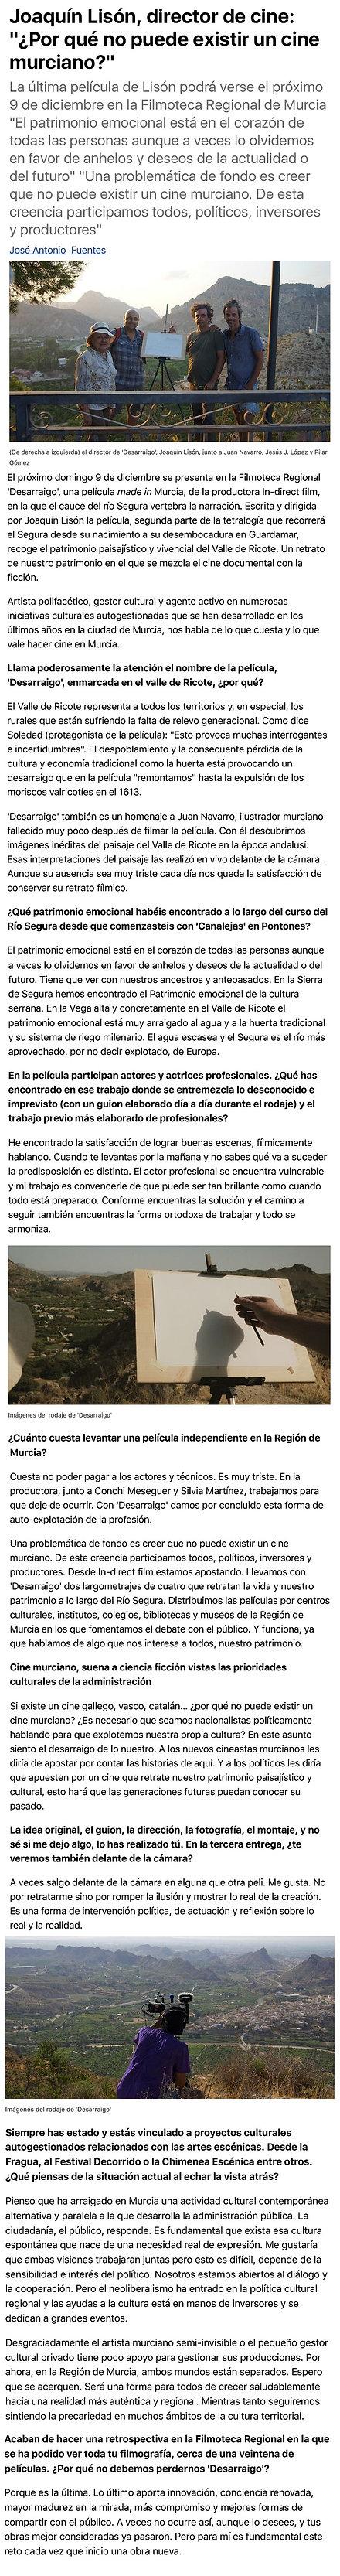 Cine Murciano.jpg